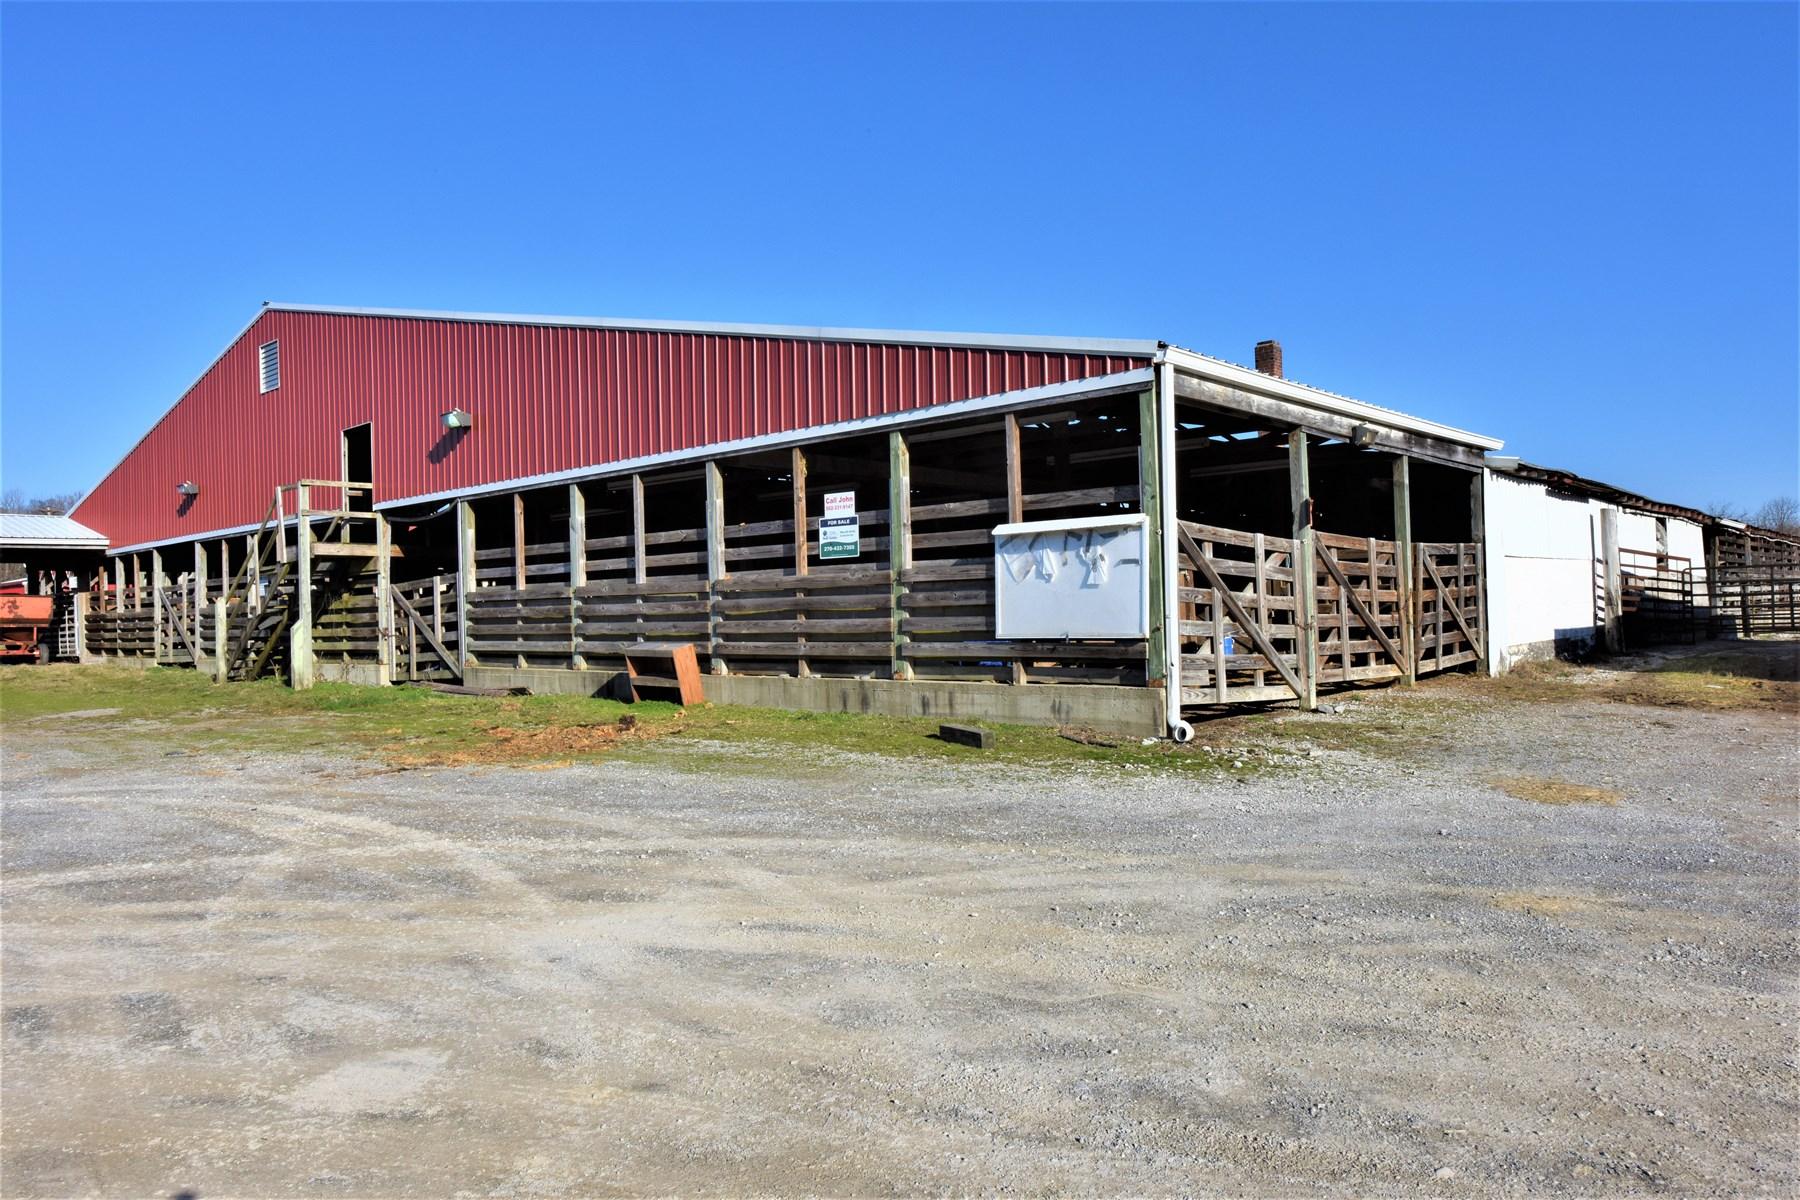 Stockyard, Business Opportunity, Good Location, Edmonton KY